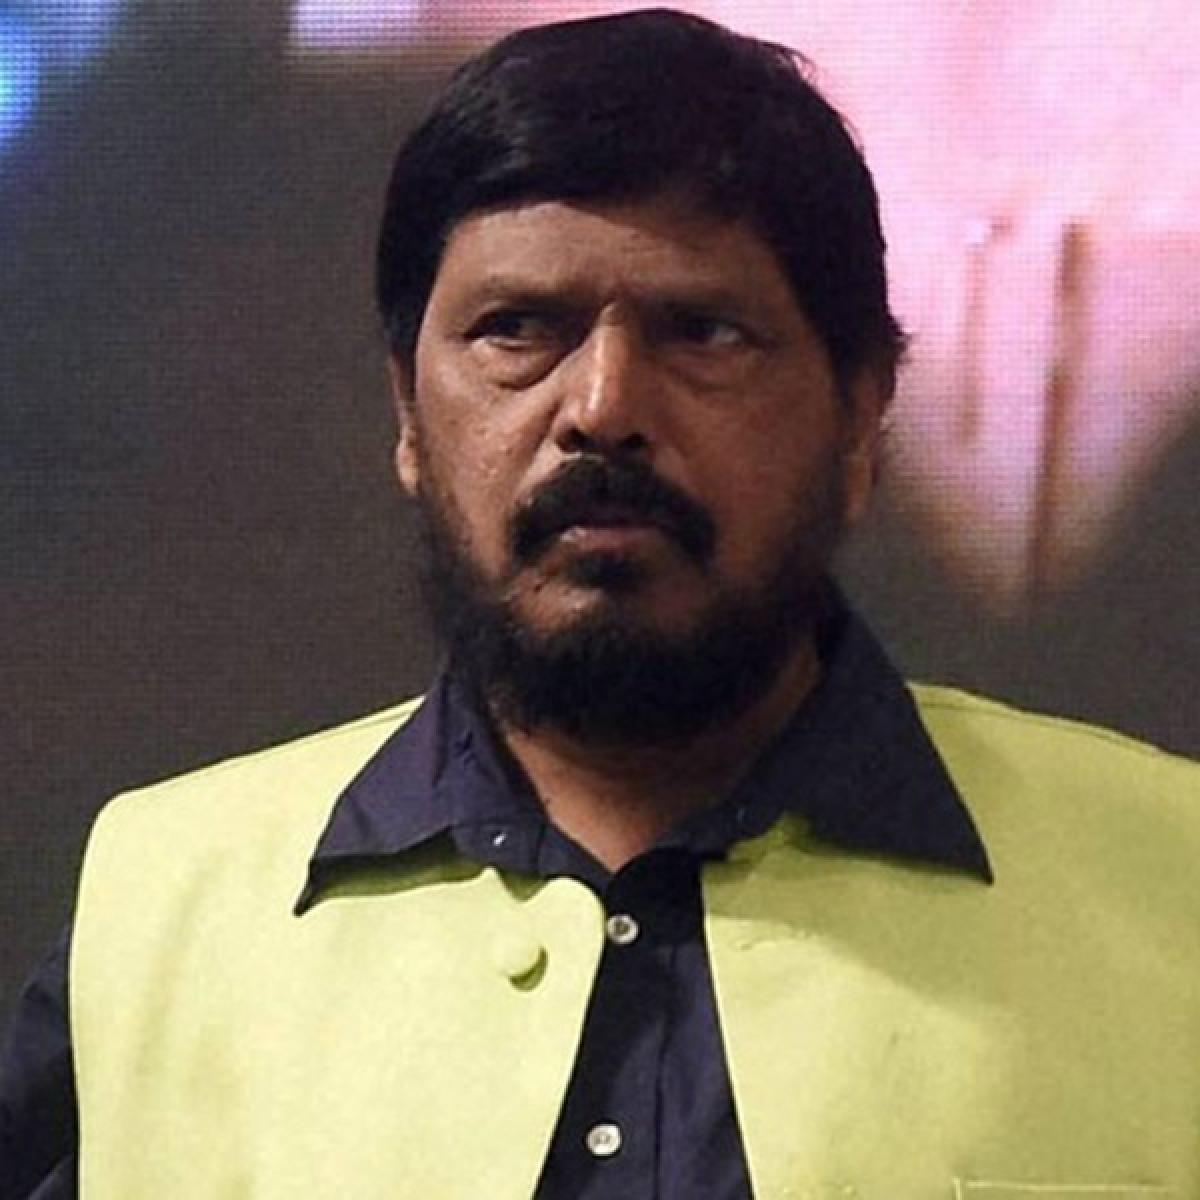 India should pressurise Pakistan for Dawood Ibrahim's handover: Ramdas Athawale